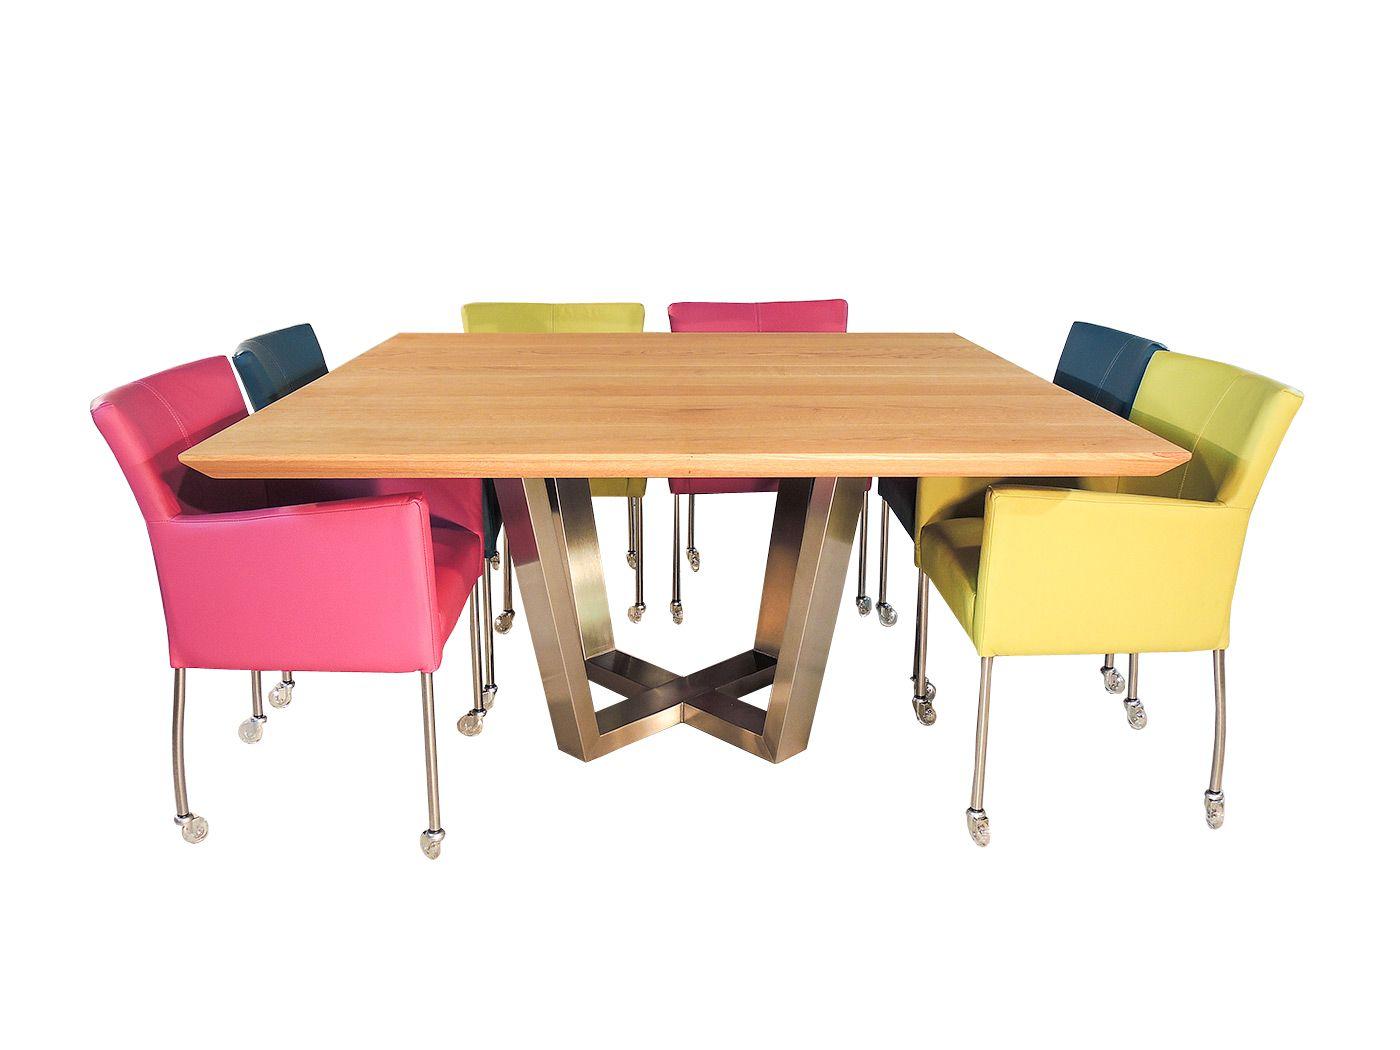 Vierkante Eettafel 12 Personen.Hampton Moderne Vierkante Tafel Vierkante Eettafel